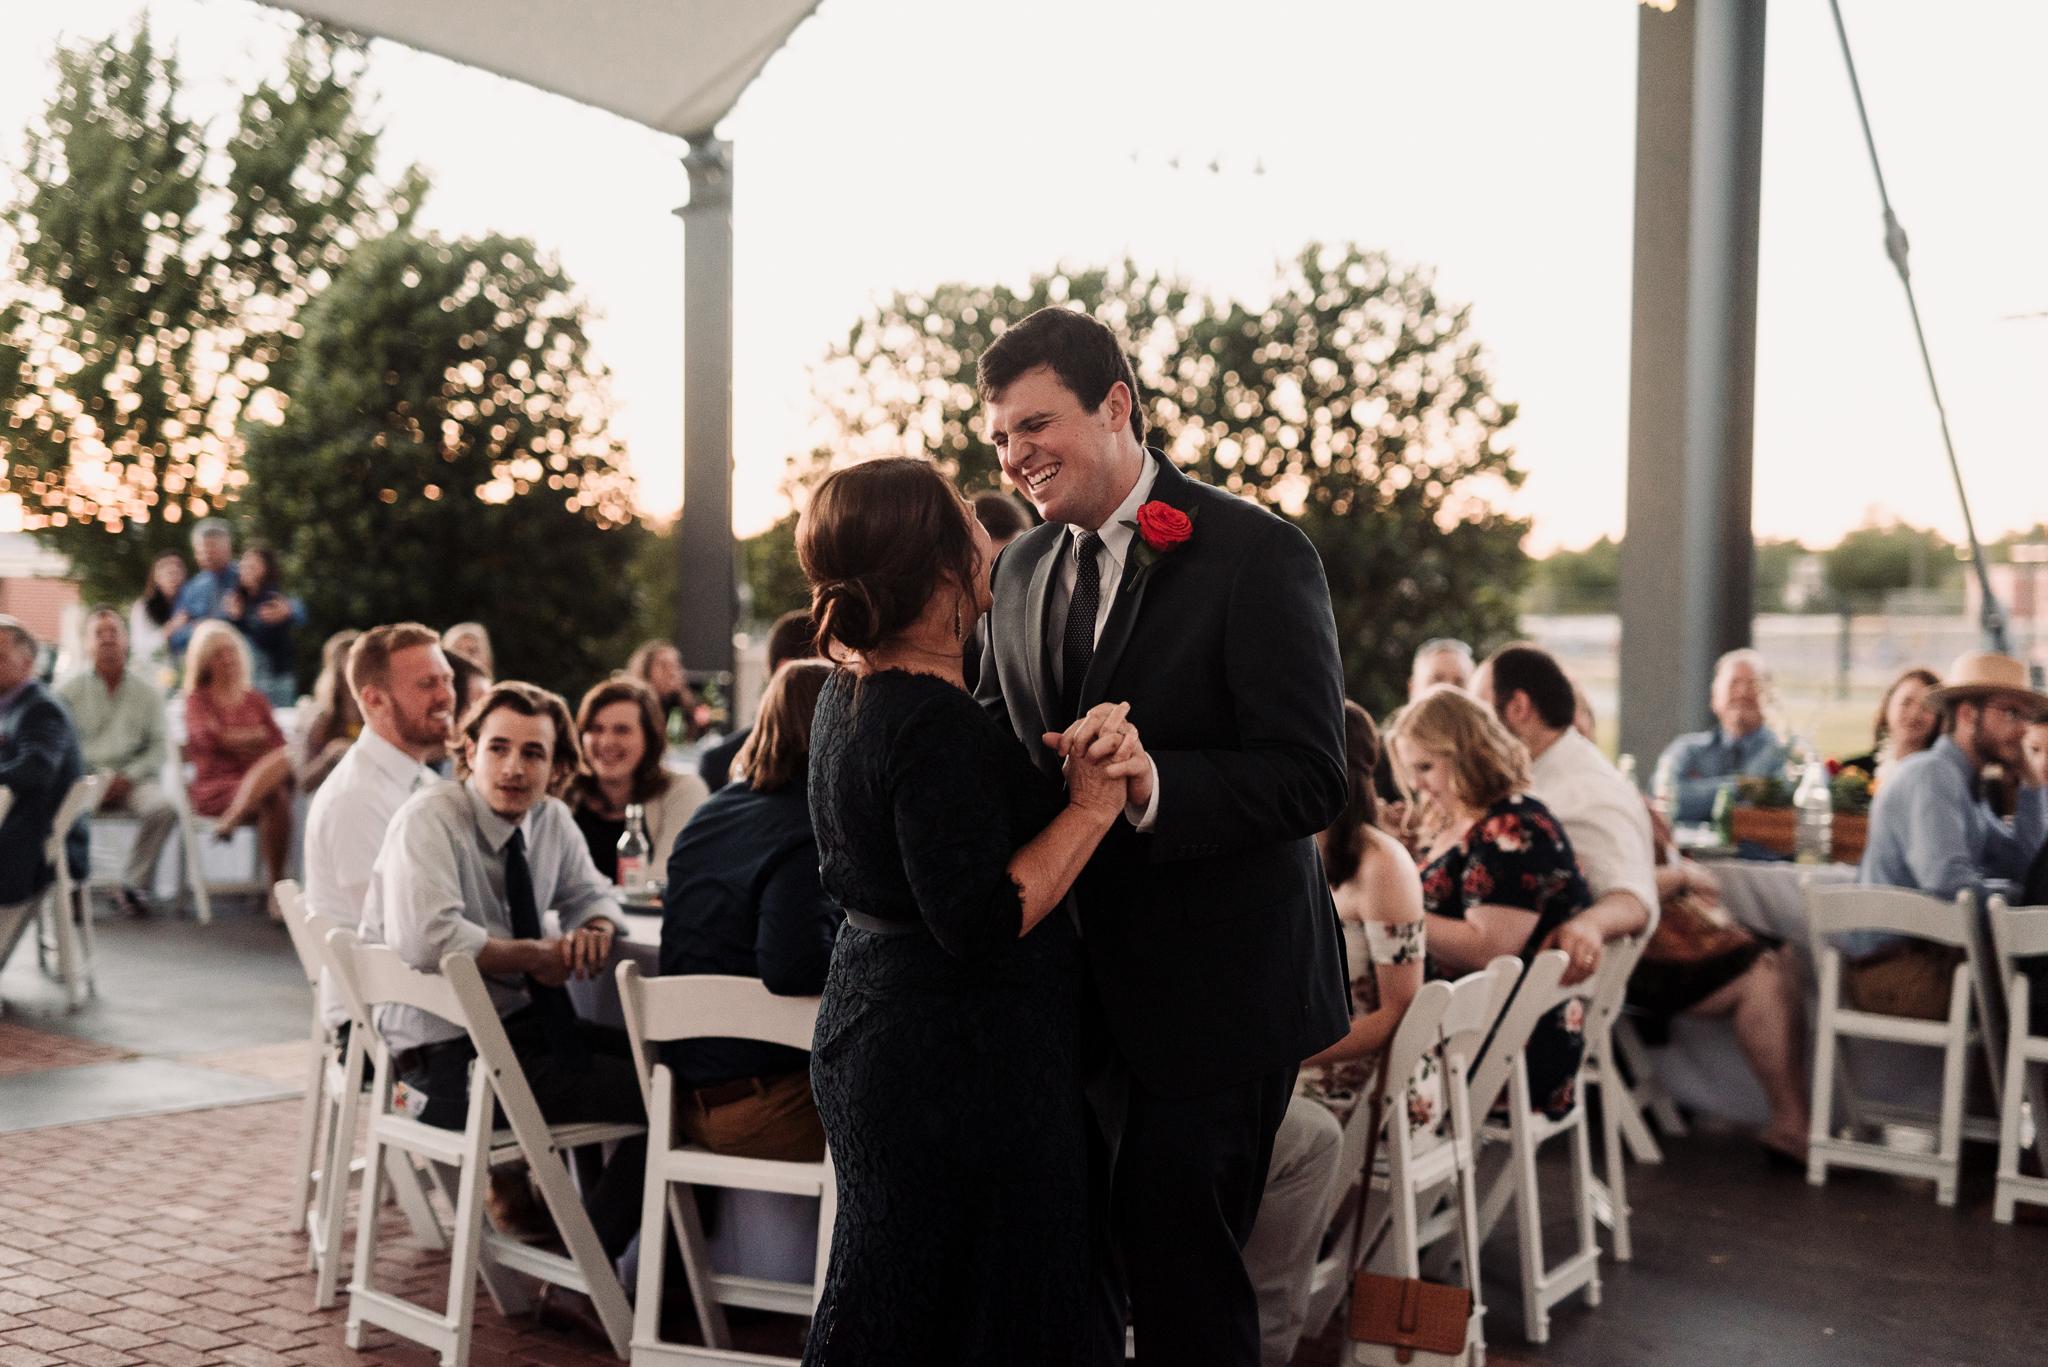 Oklahoma-Christian-University-Wedding-9284.jpg